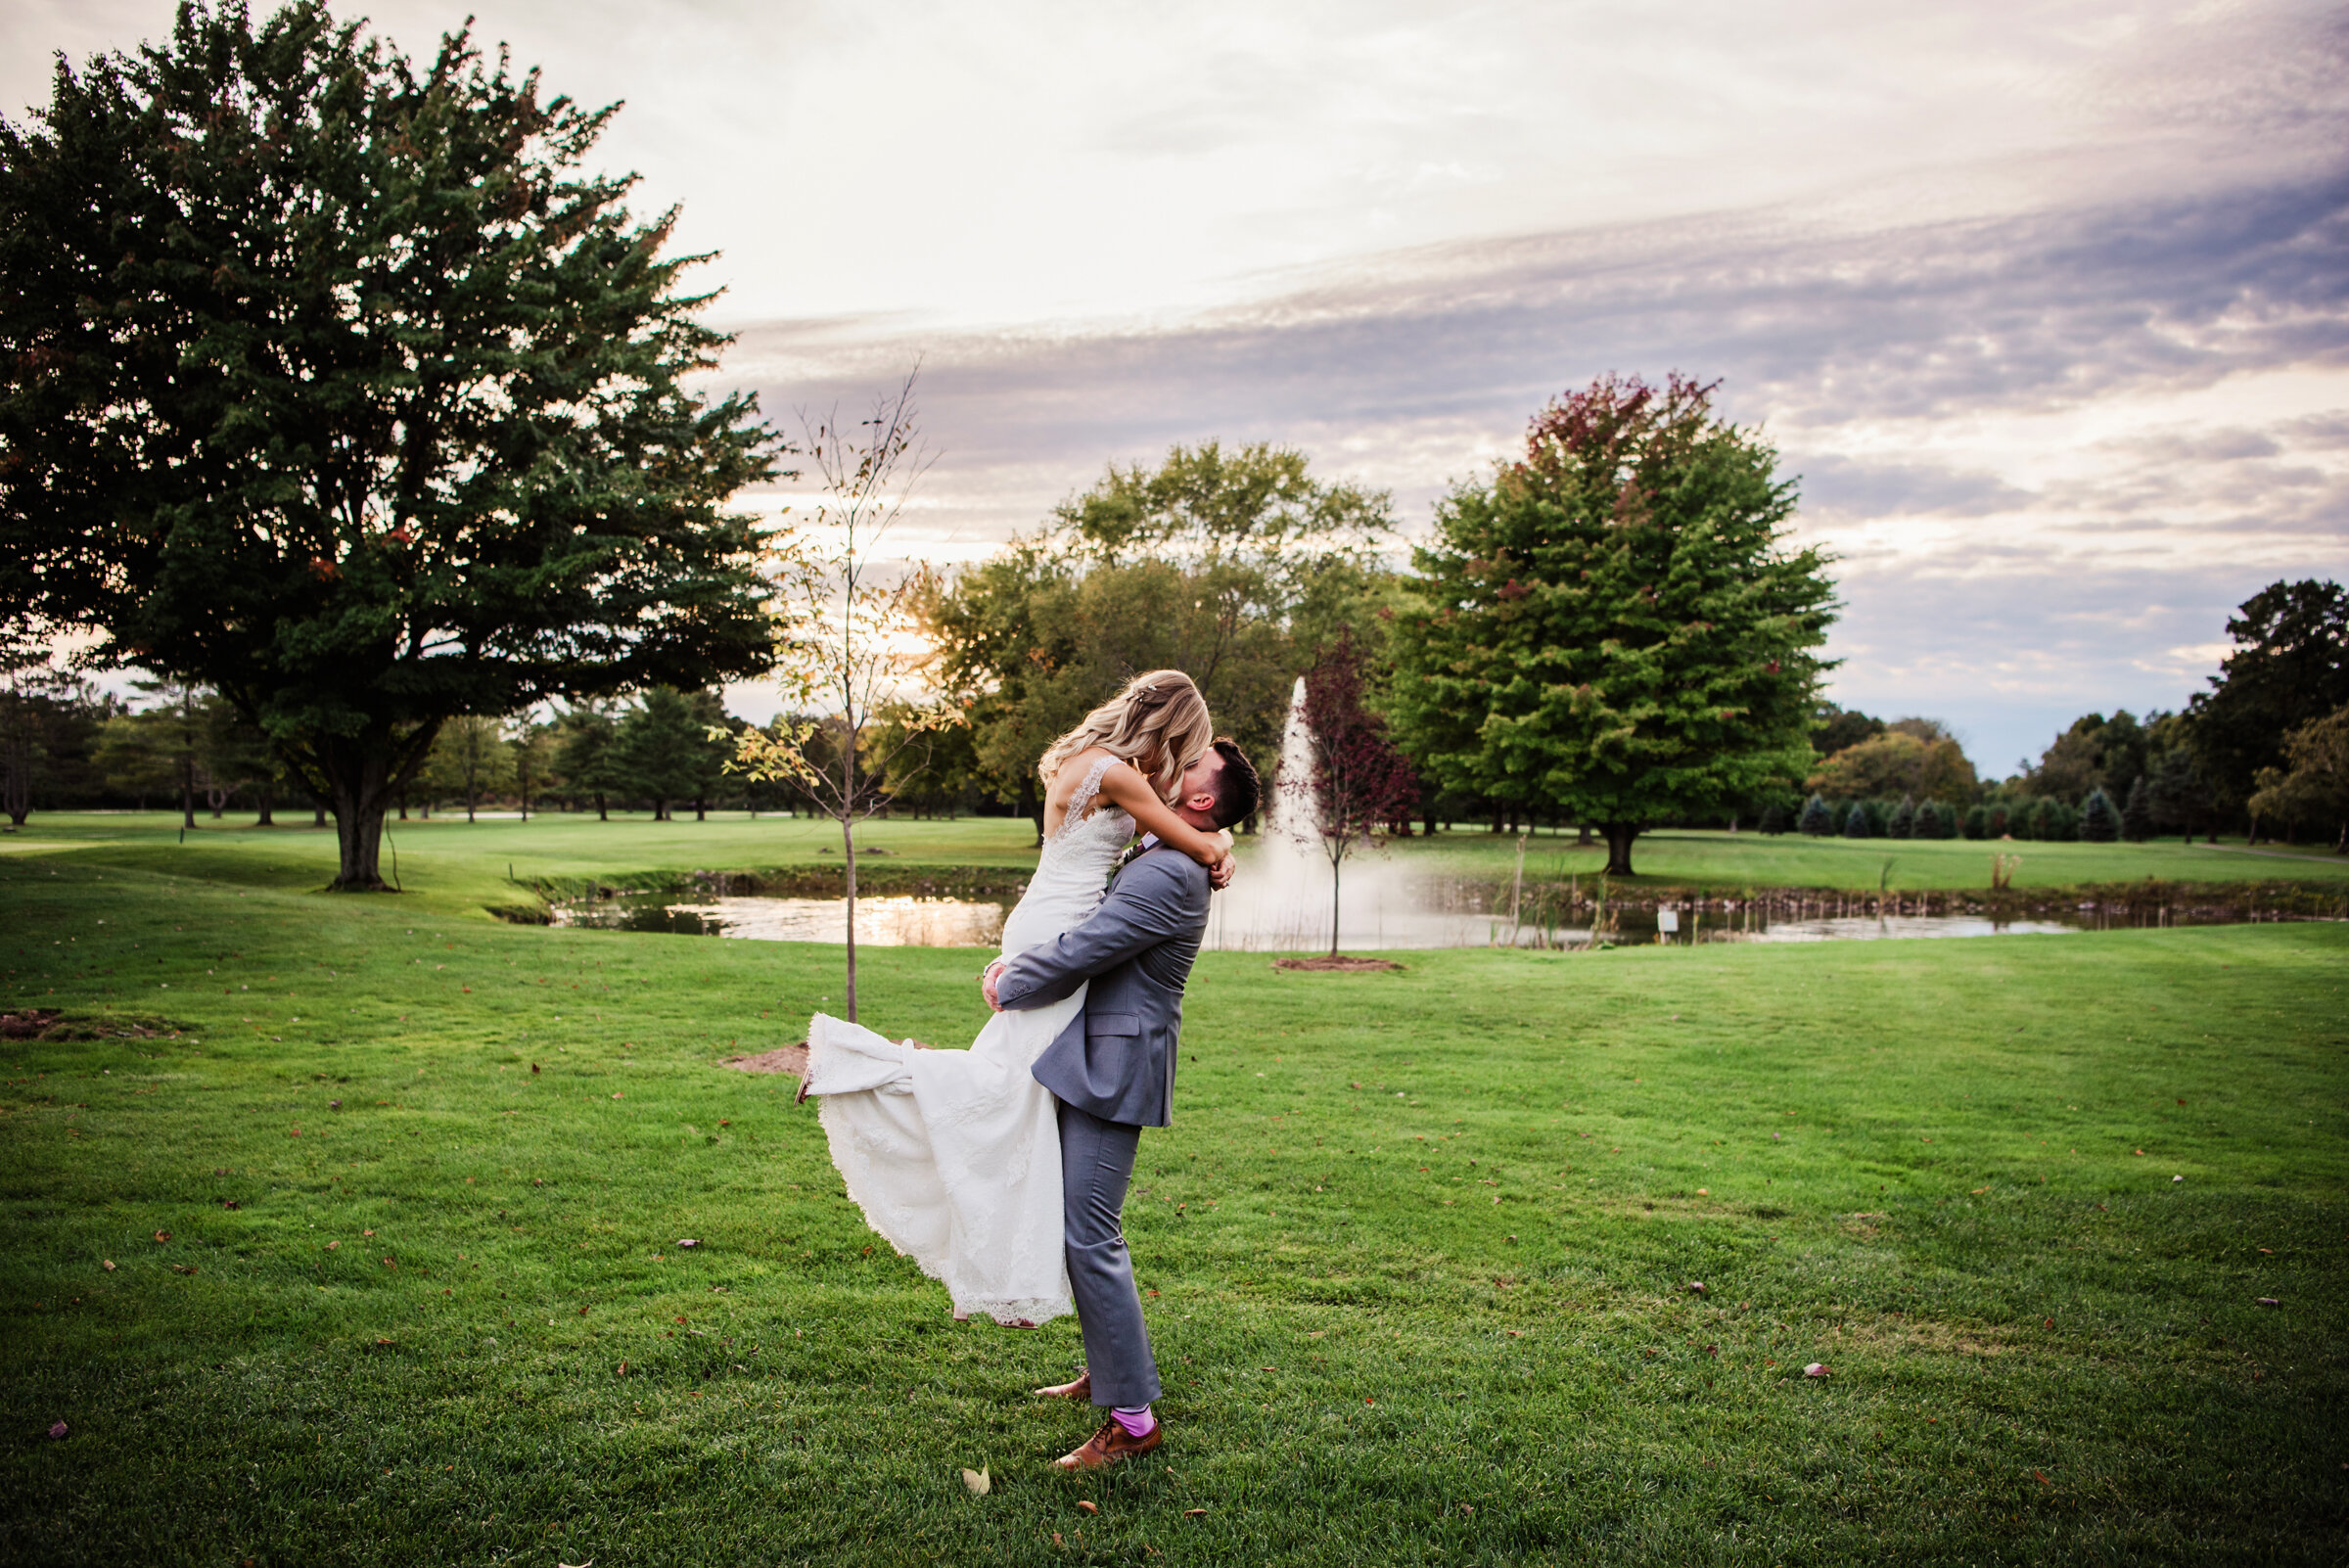 Deerfield_Country_Club_Rochester_Wedding_JILL_STUDIO_Rochester_NY_Photographer_DSC_7004.jpg